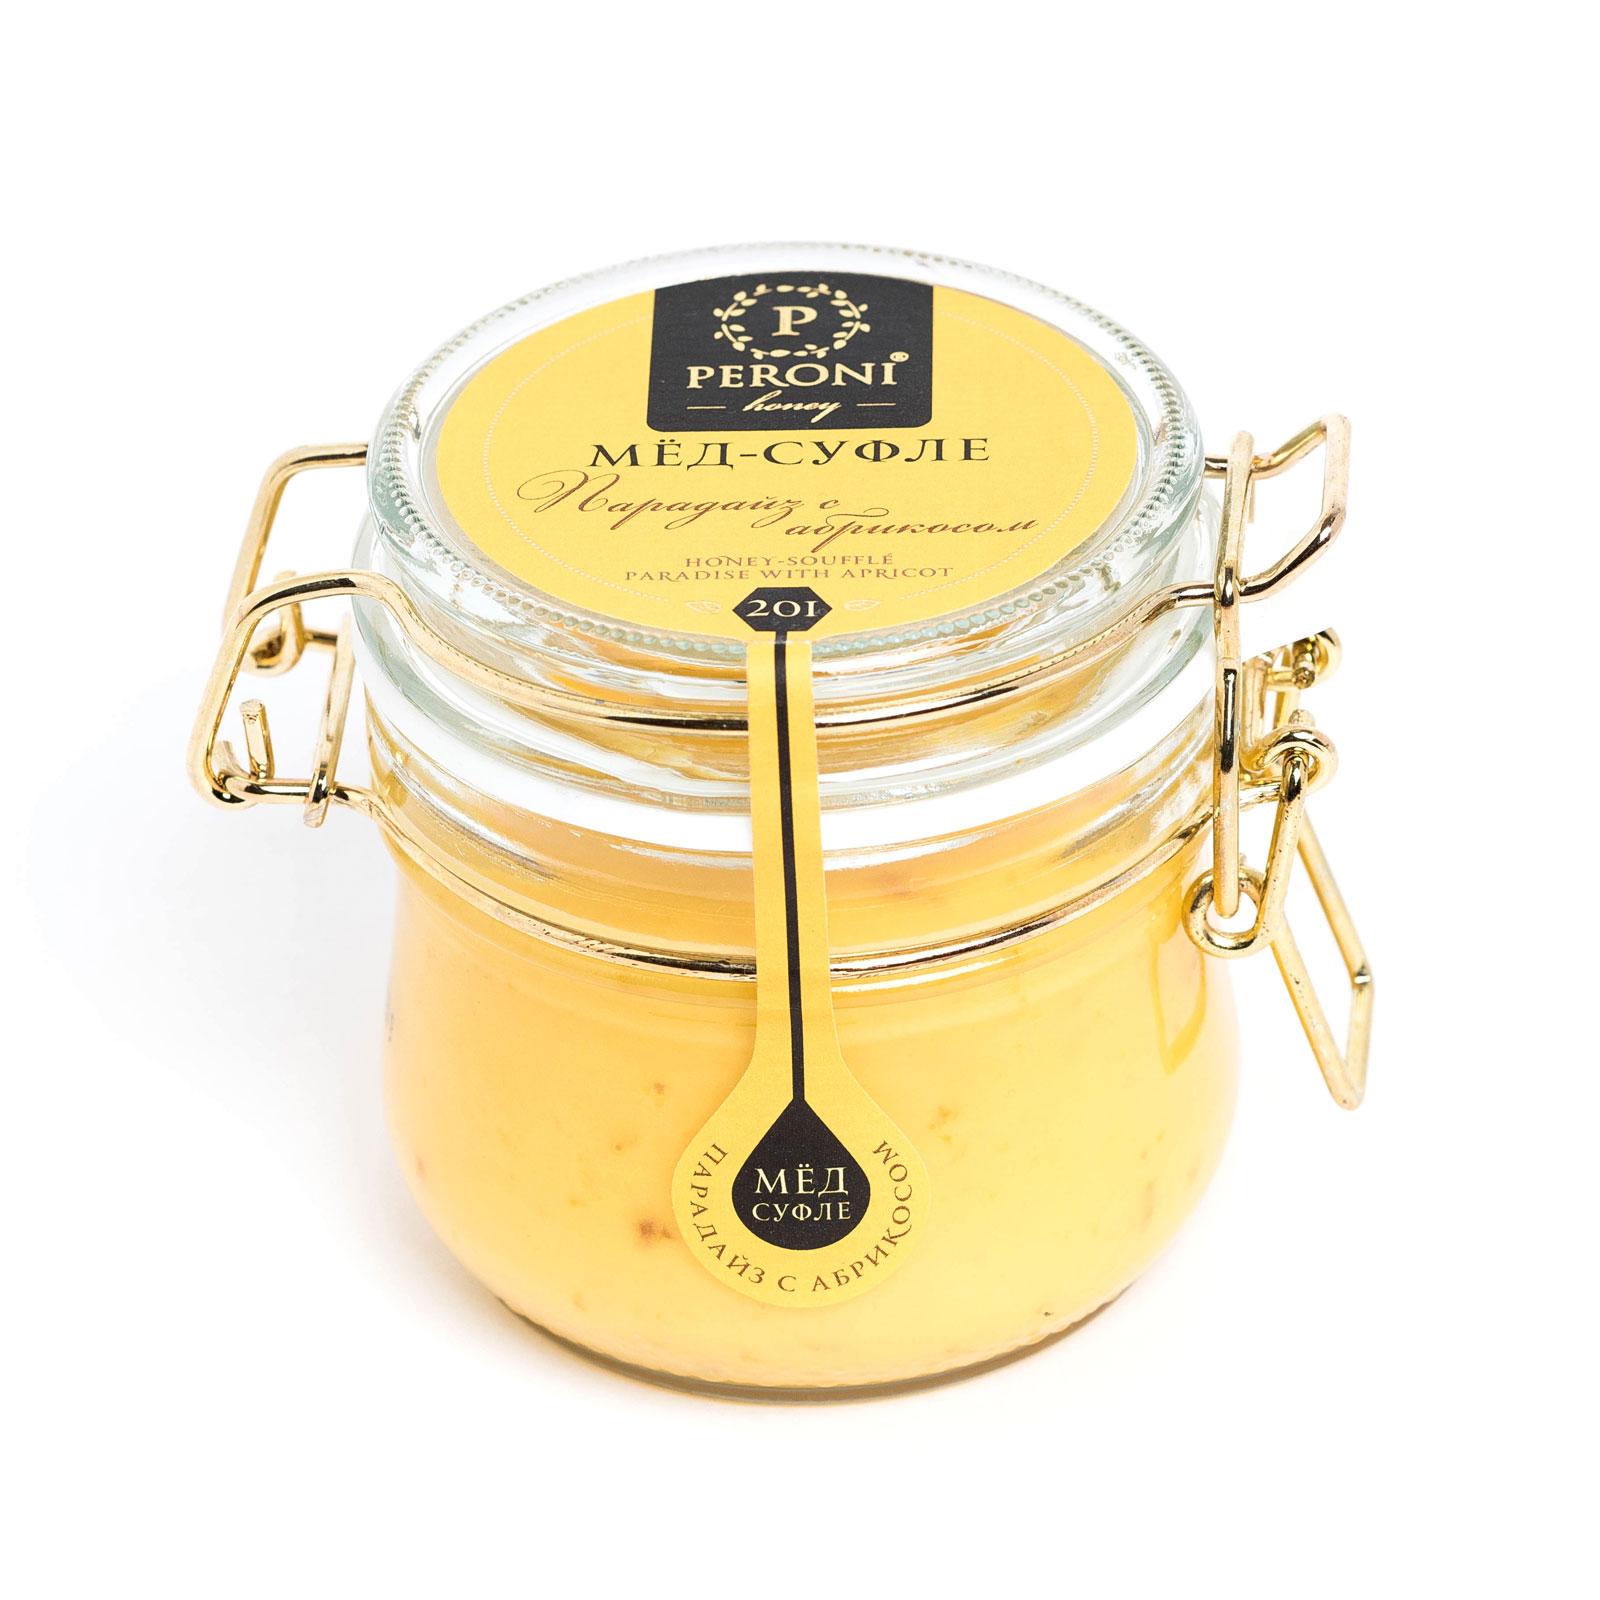 Мёд-суфле Peroni Honey 250 мл Парадайз с абрикосом<br>